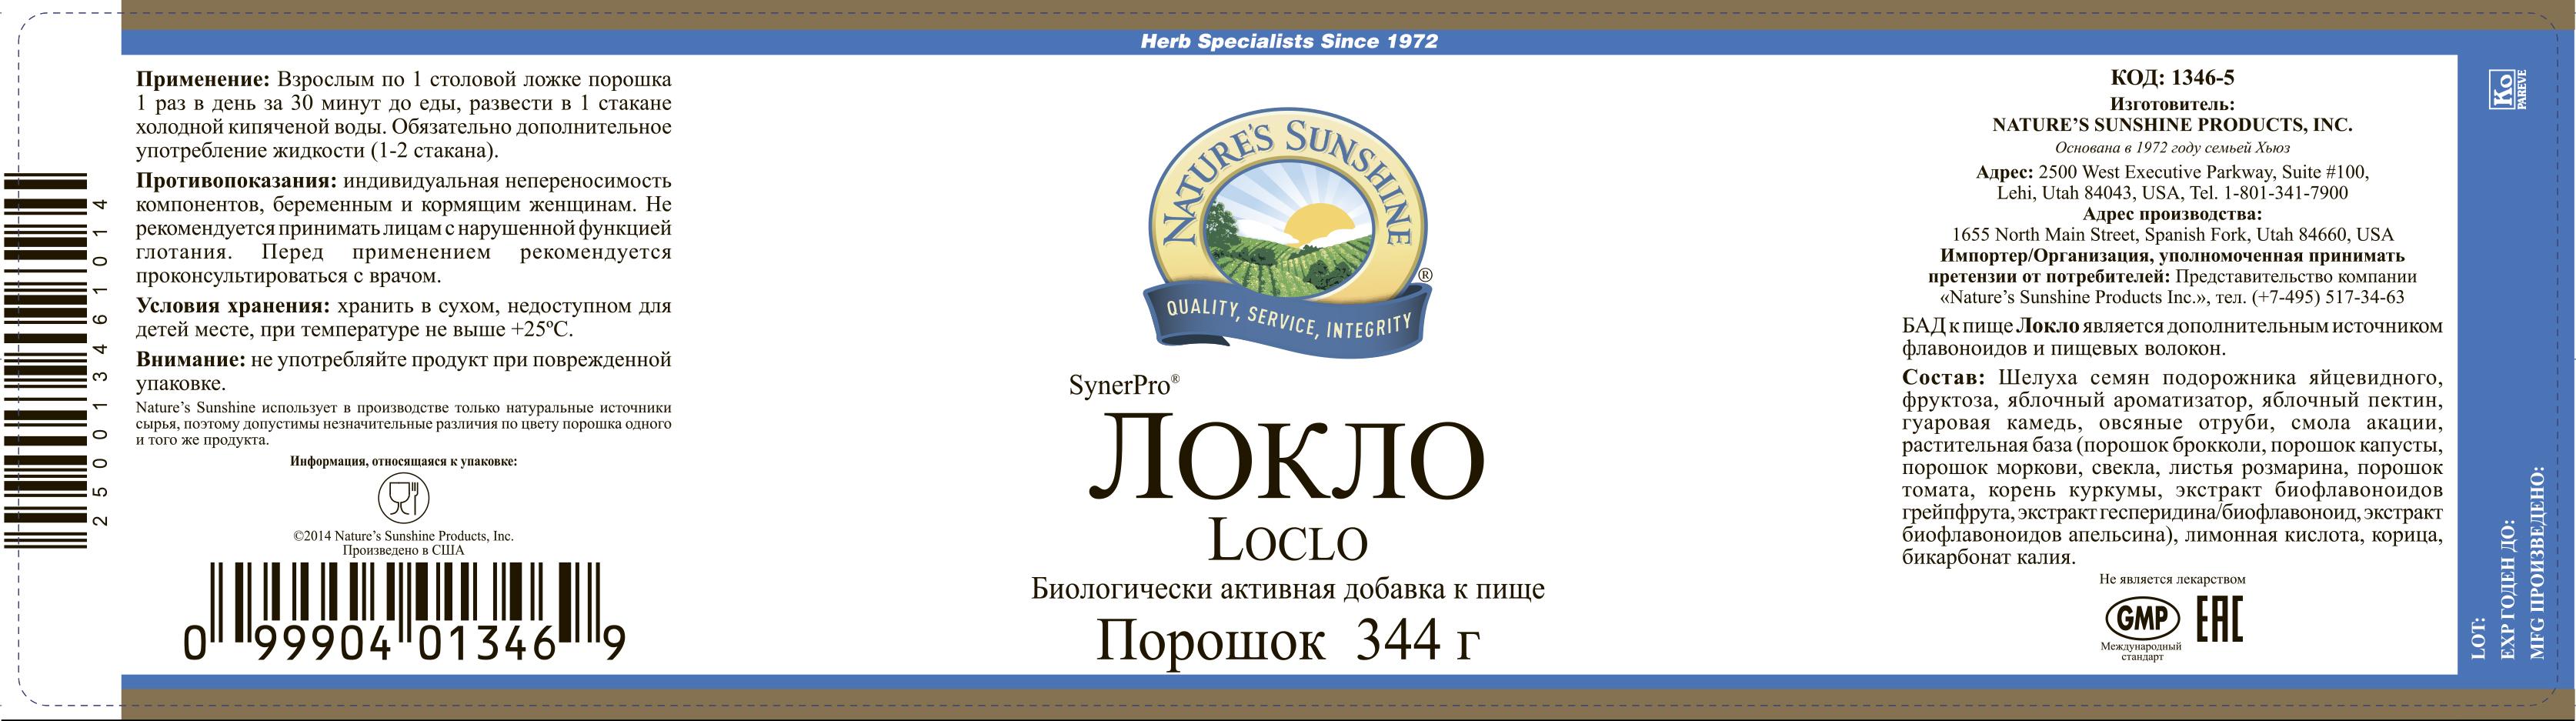 Картинка Локло / Loclo от магазина Nature's Sunshine Products